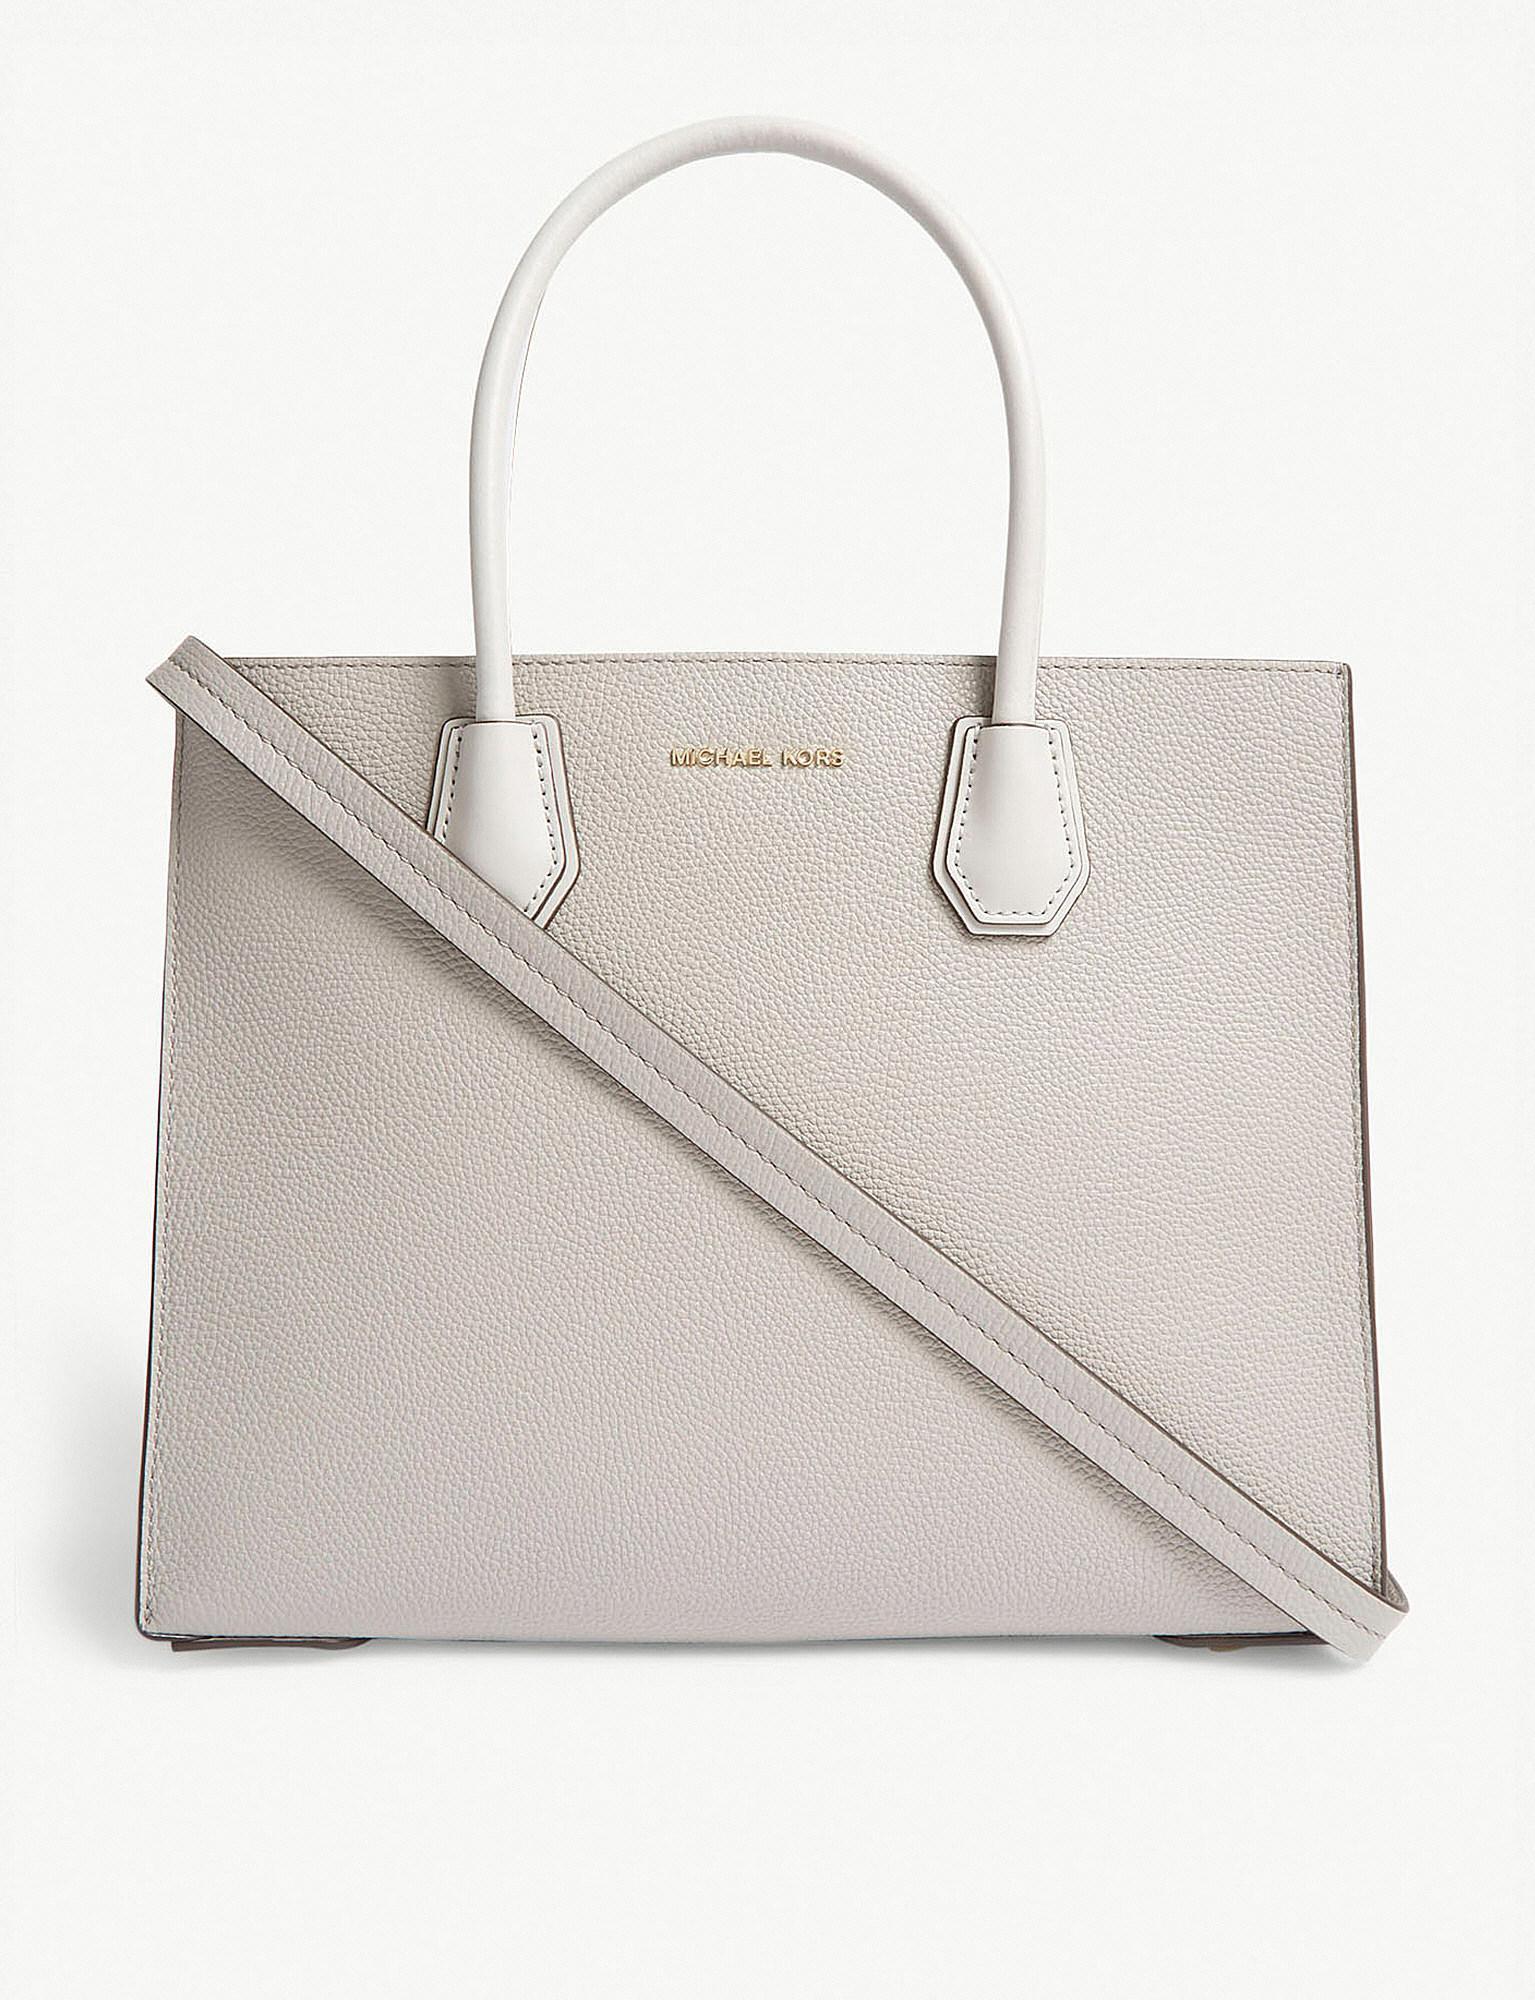 73e6923bcdc657 MICHAEL Michael Kors. Women's Gray Michael Kors Pearl Grey Mercer Accordion  Leather Tote Bag